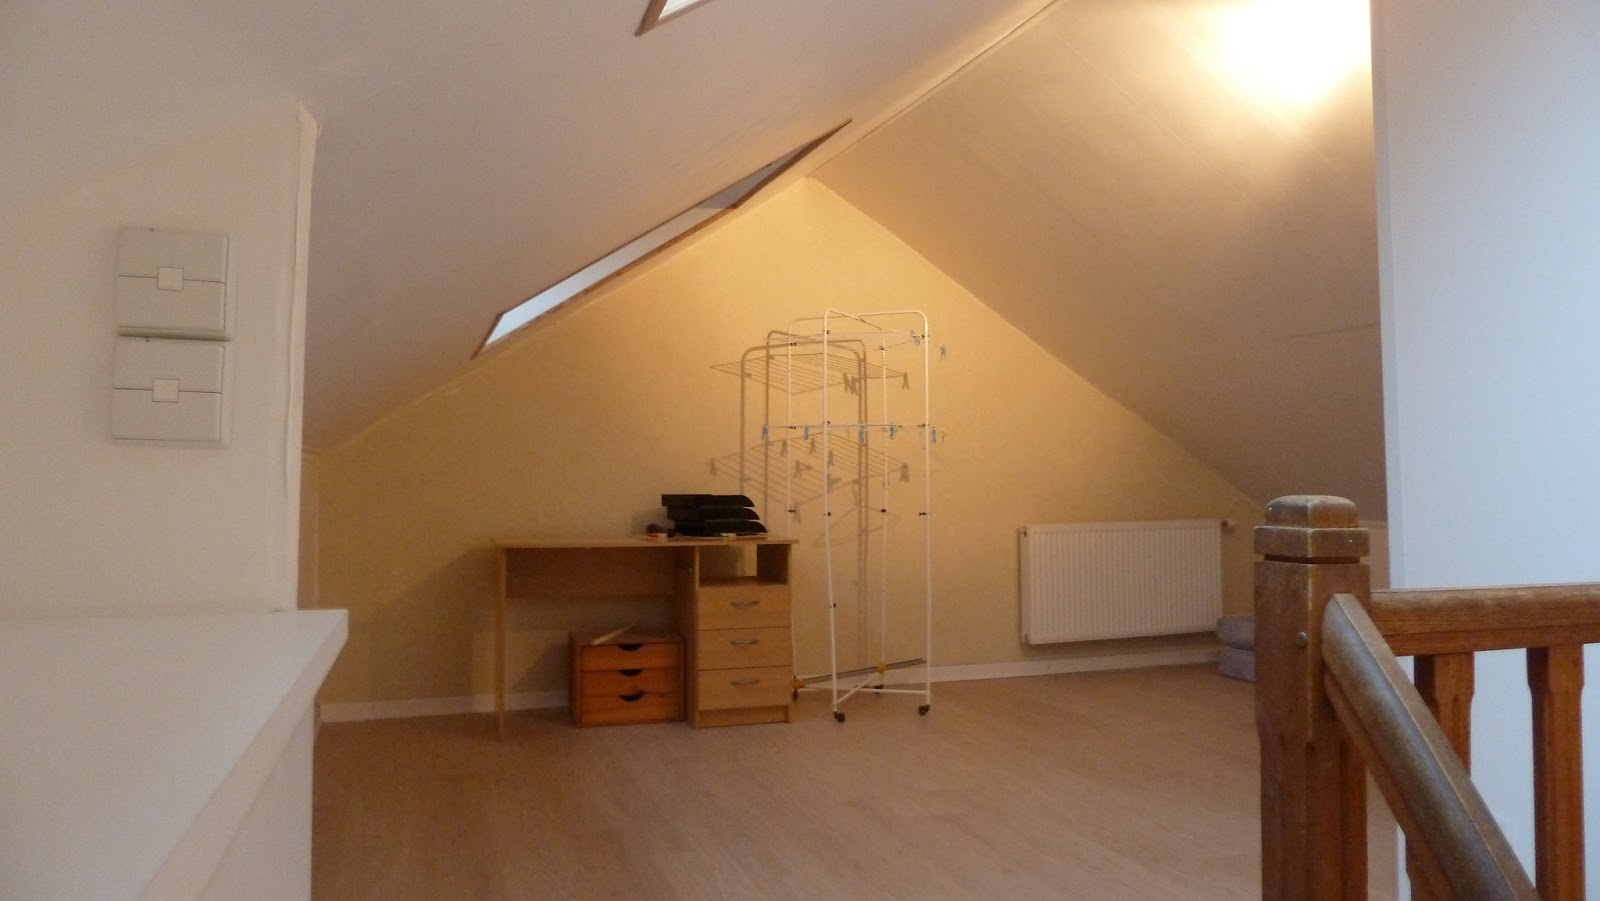 Chambre loft falk - Salle de bain loft new yorkais ...